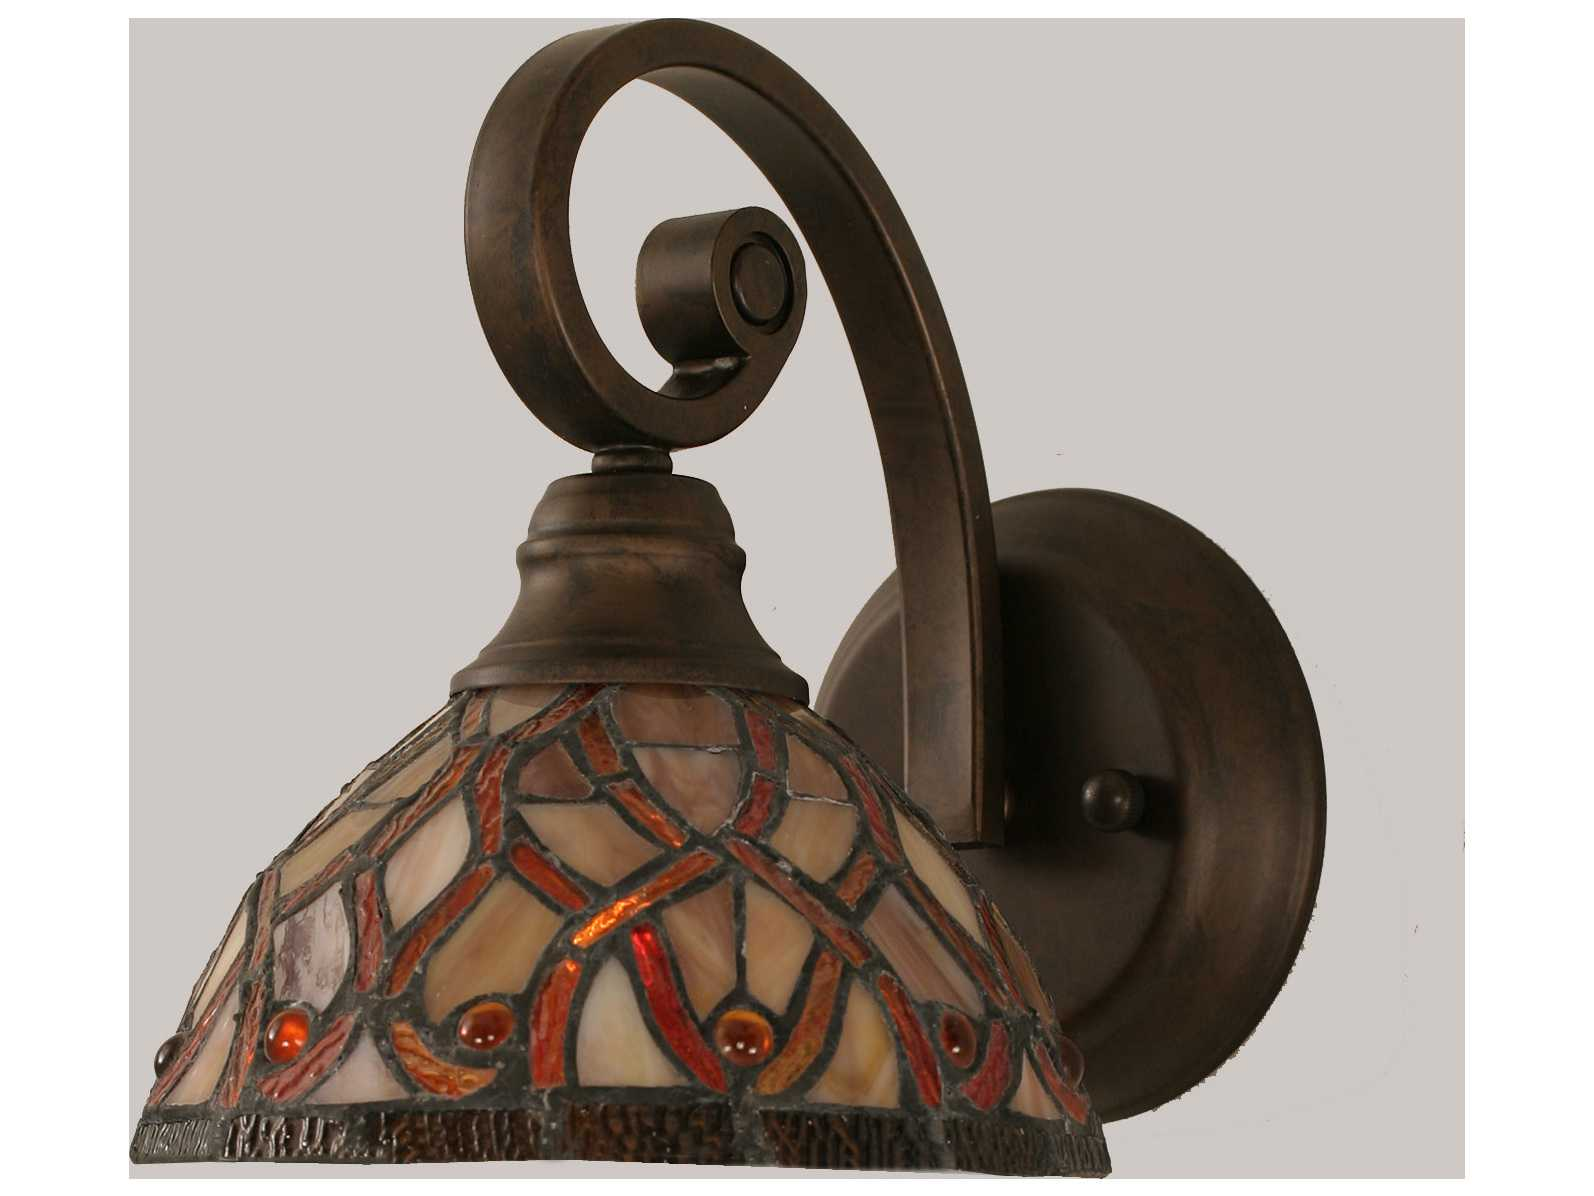 Toltec Lighting Curl Bronze & Persian Nites Mini Tiffany Glass Wall Sconce TOL151BRZ9915